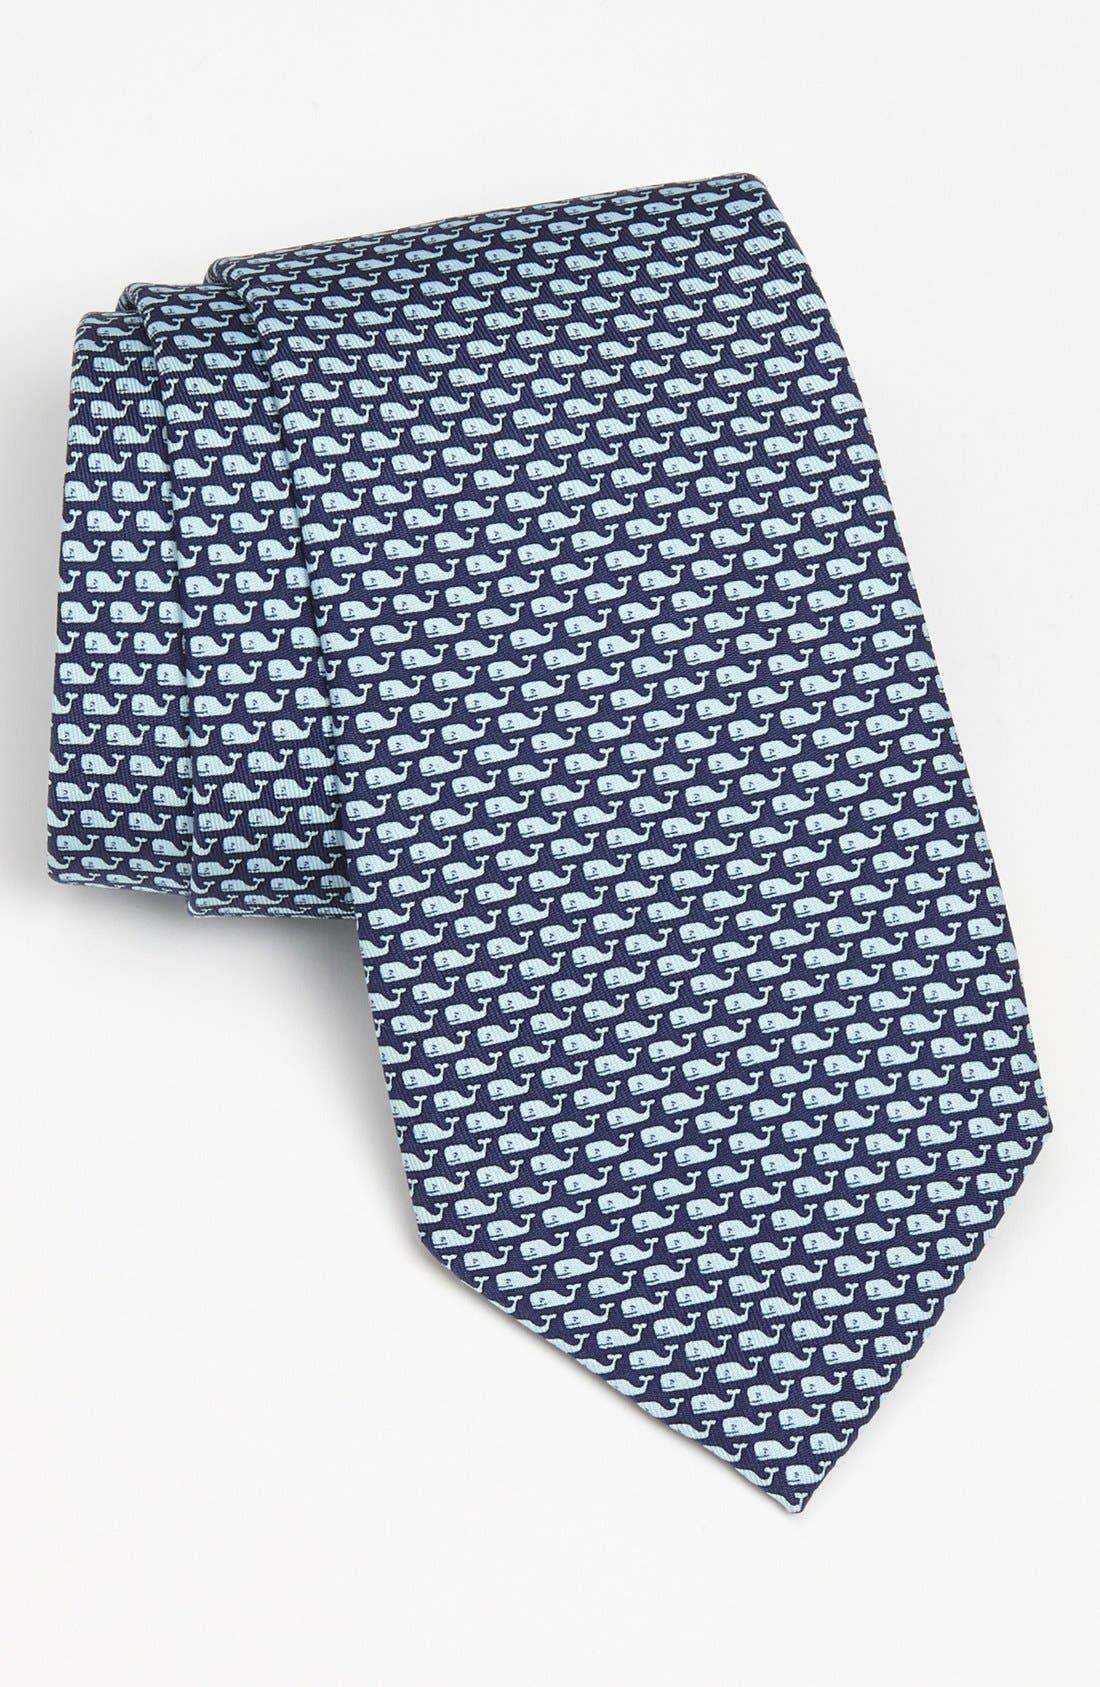 Main Image - Vineyard Vines 'Whale' Silk Tie